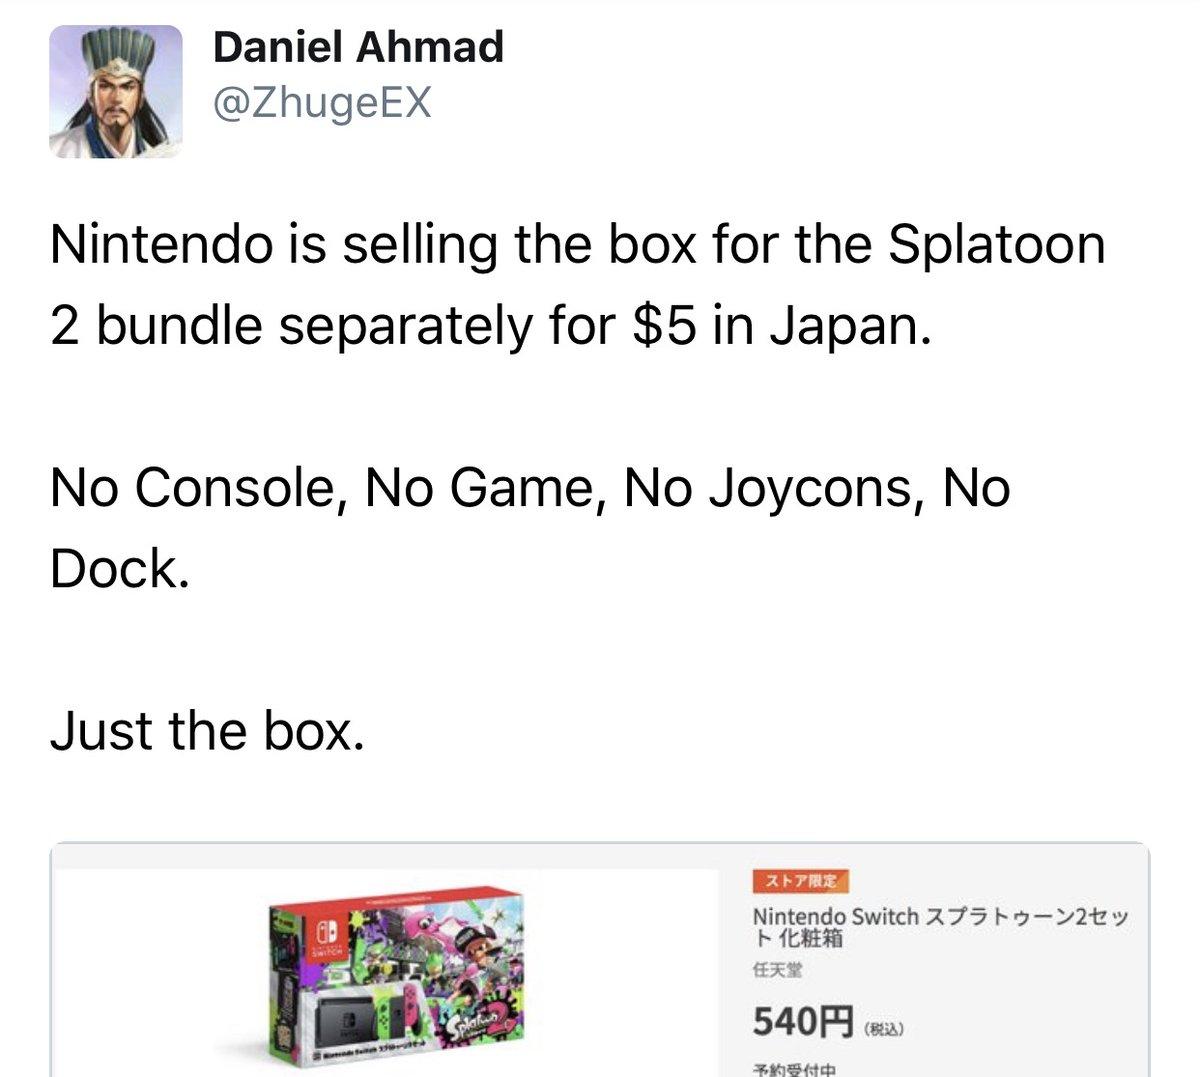 Se venden cajas de Nintendo Switch por separado a cuatro euros